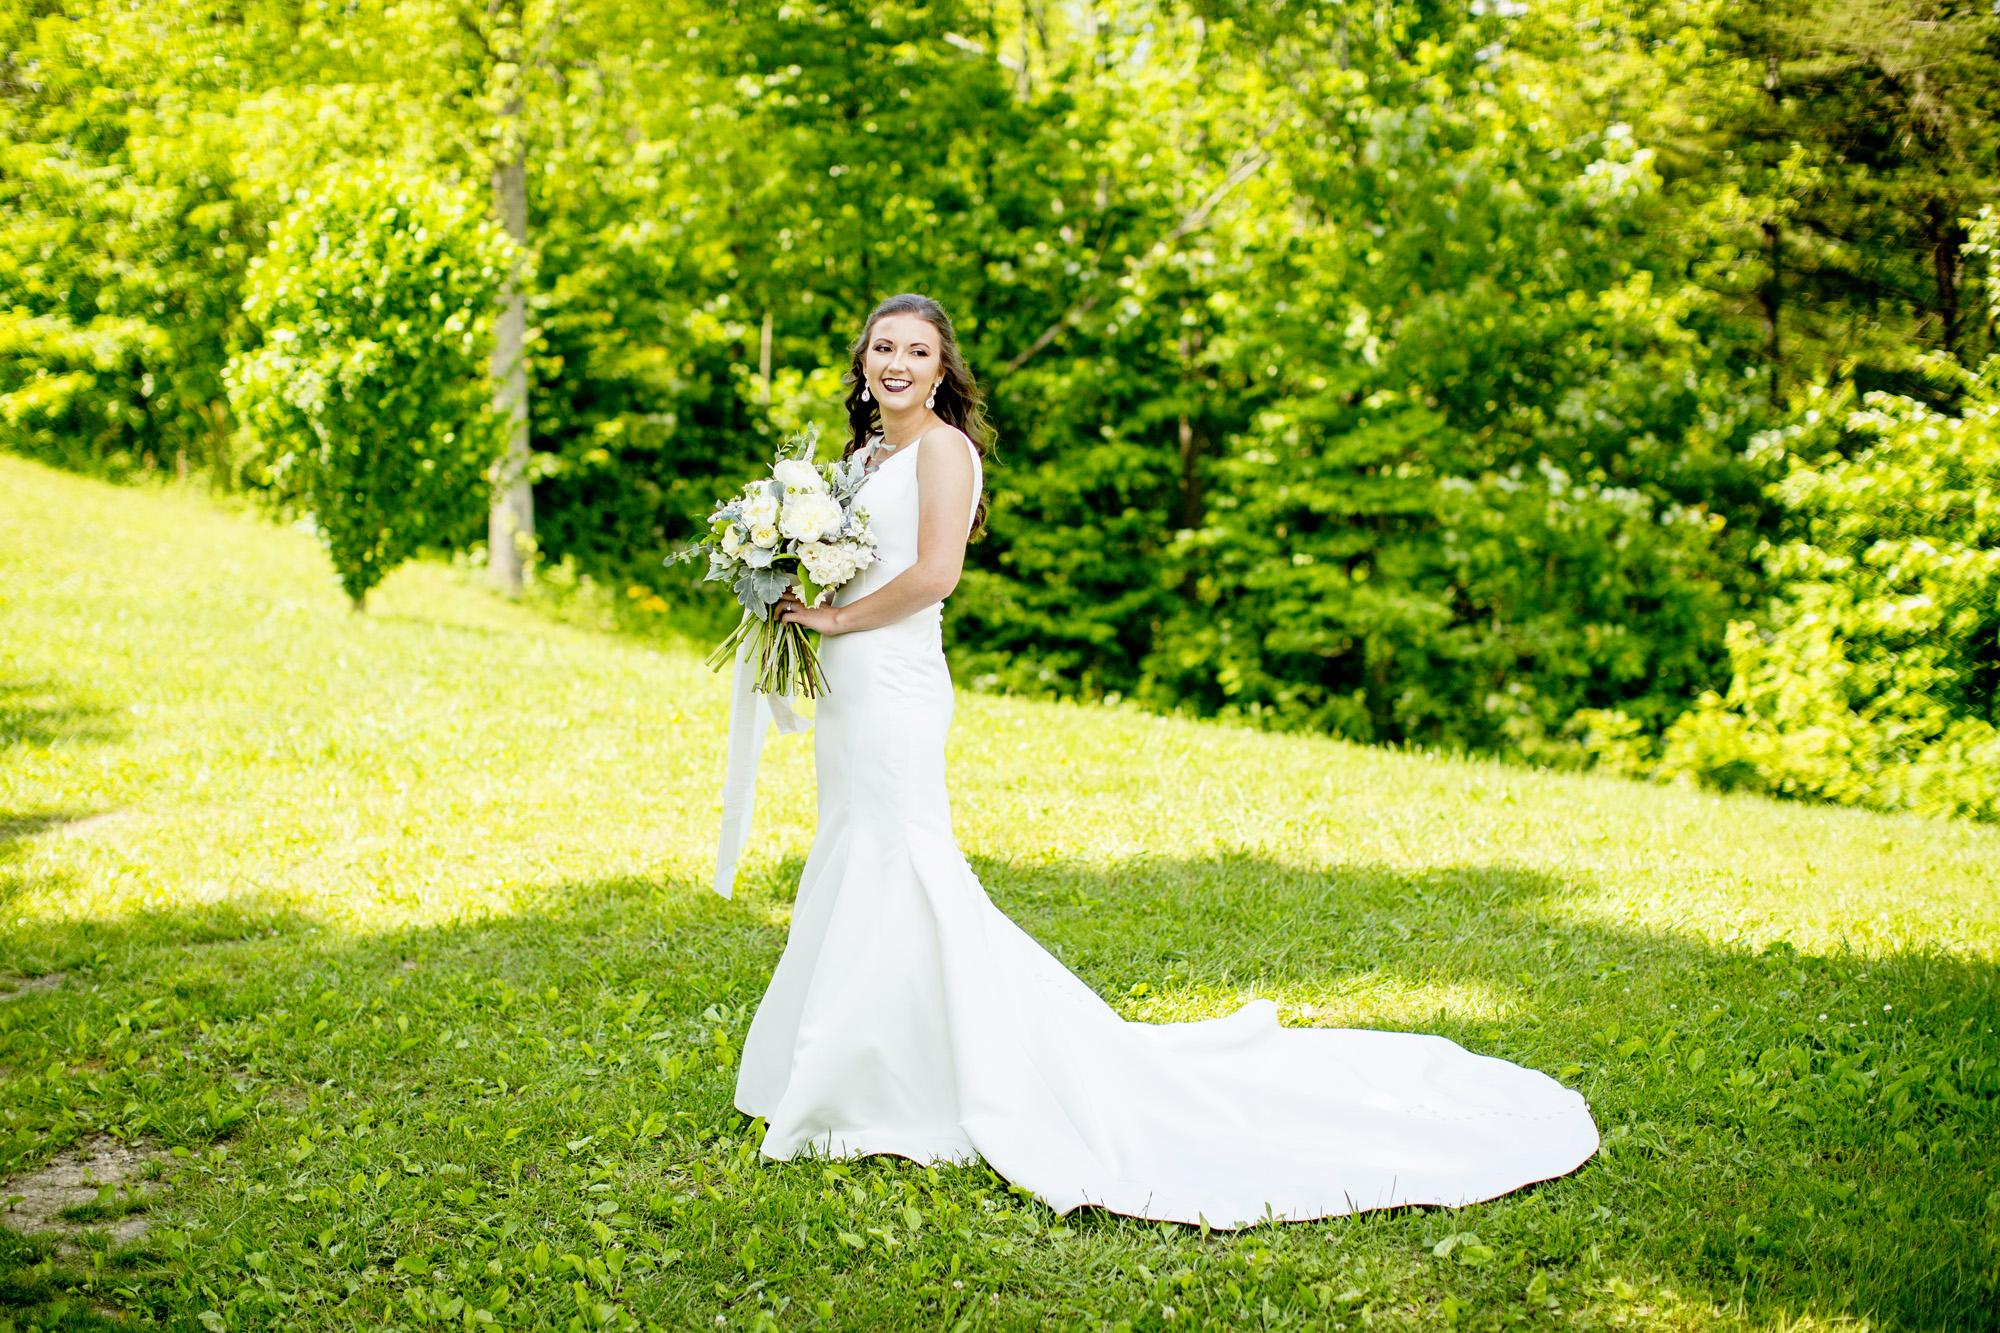 Seriously_Sabrina_Photography_Red_River_Gorge_Wedding_Barn_Robinson38.jpg